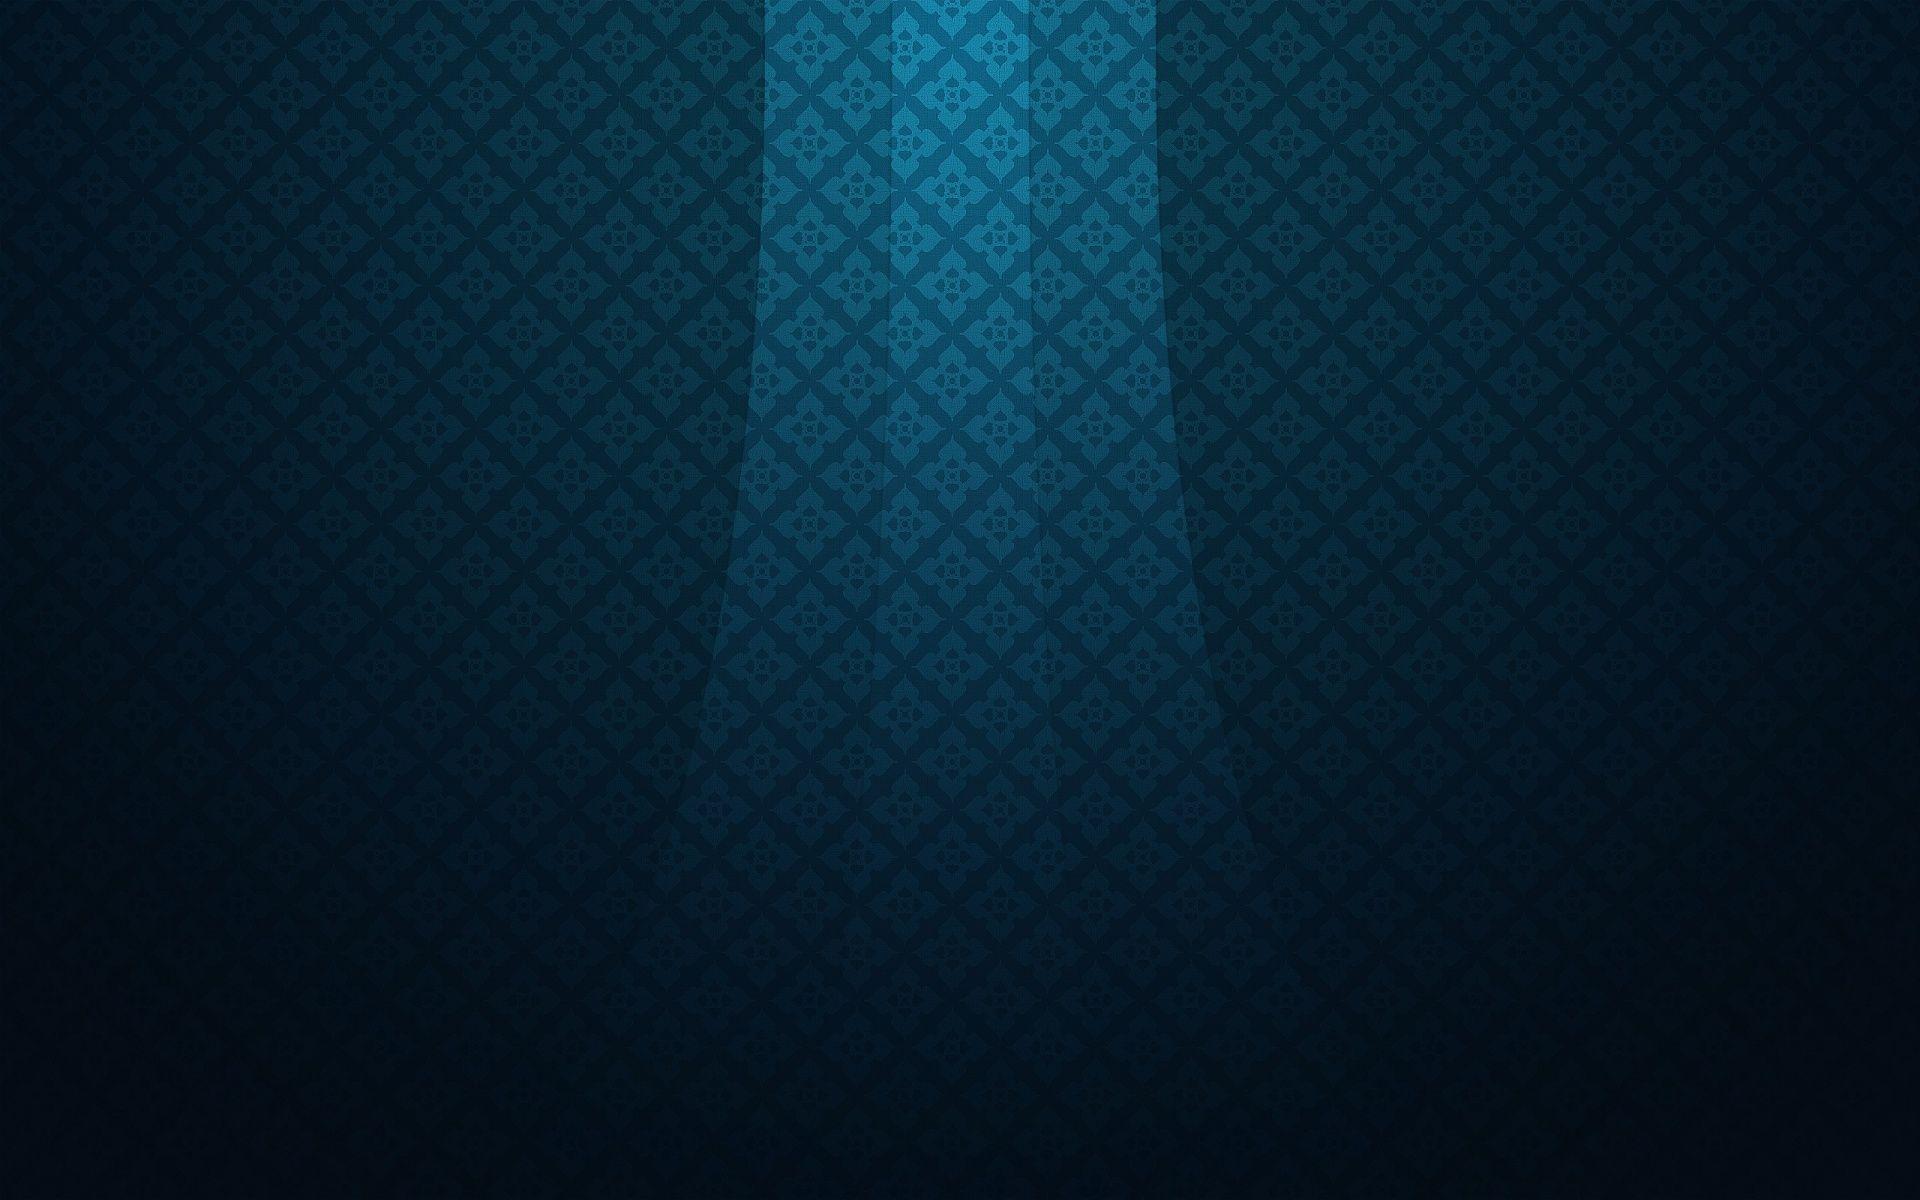 Download Wallpaper Mac Blue - 5245d5f5d0bce4d1bcc6436d3c9fca27  Snapshot_239971.jpg